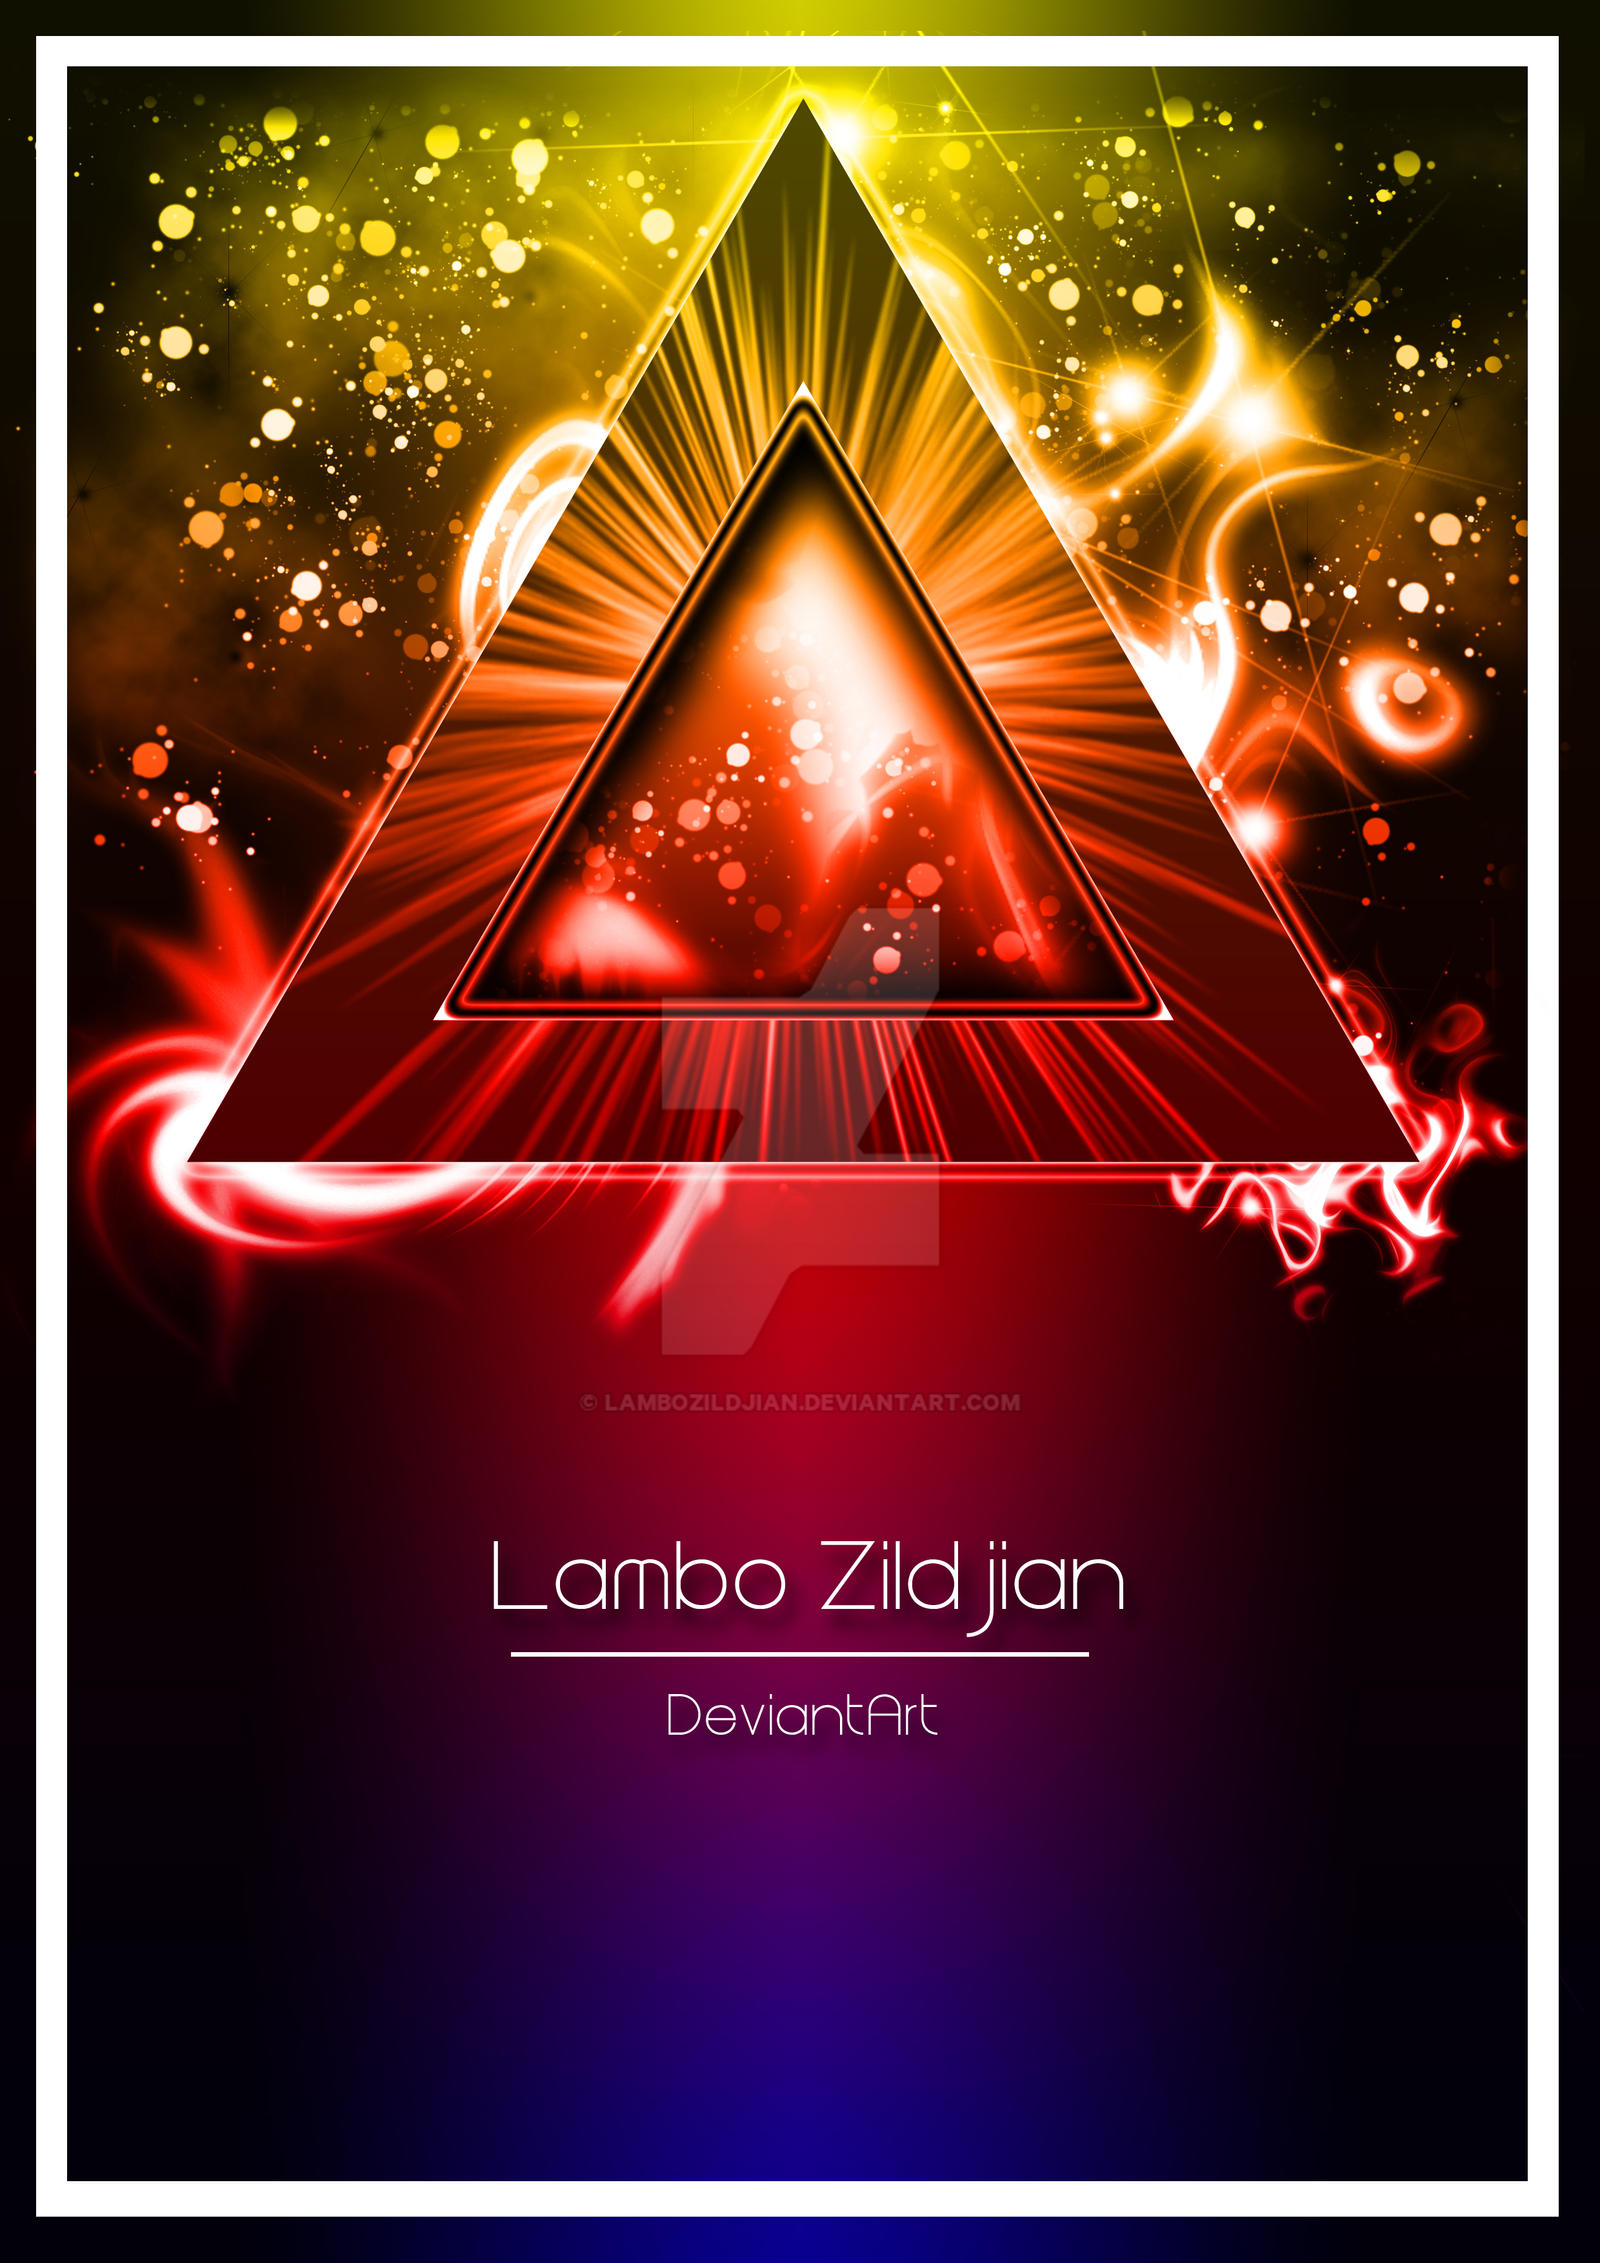 The Vibrant Triangle by LamboZildjian